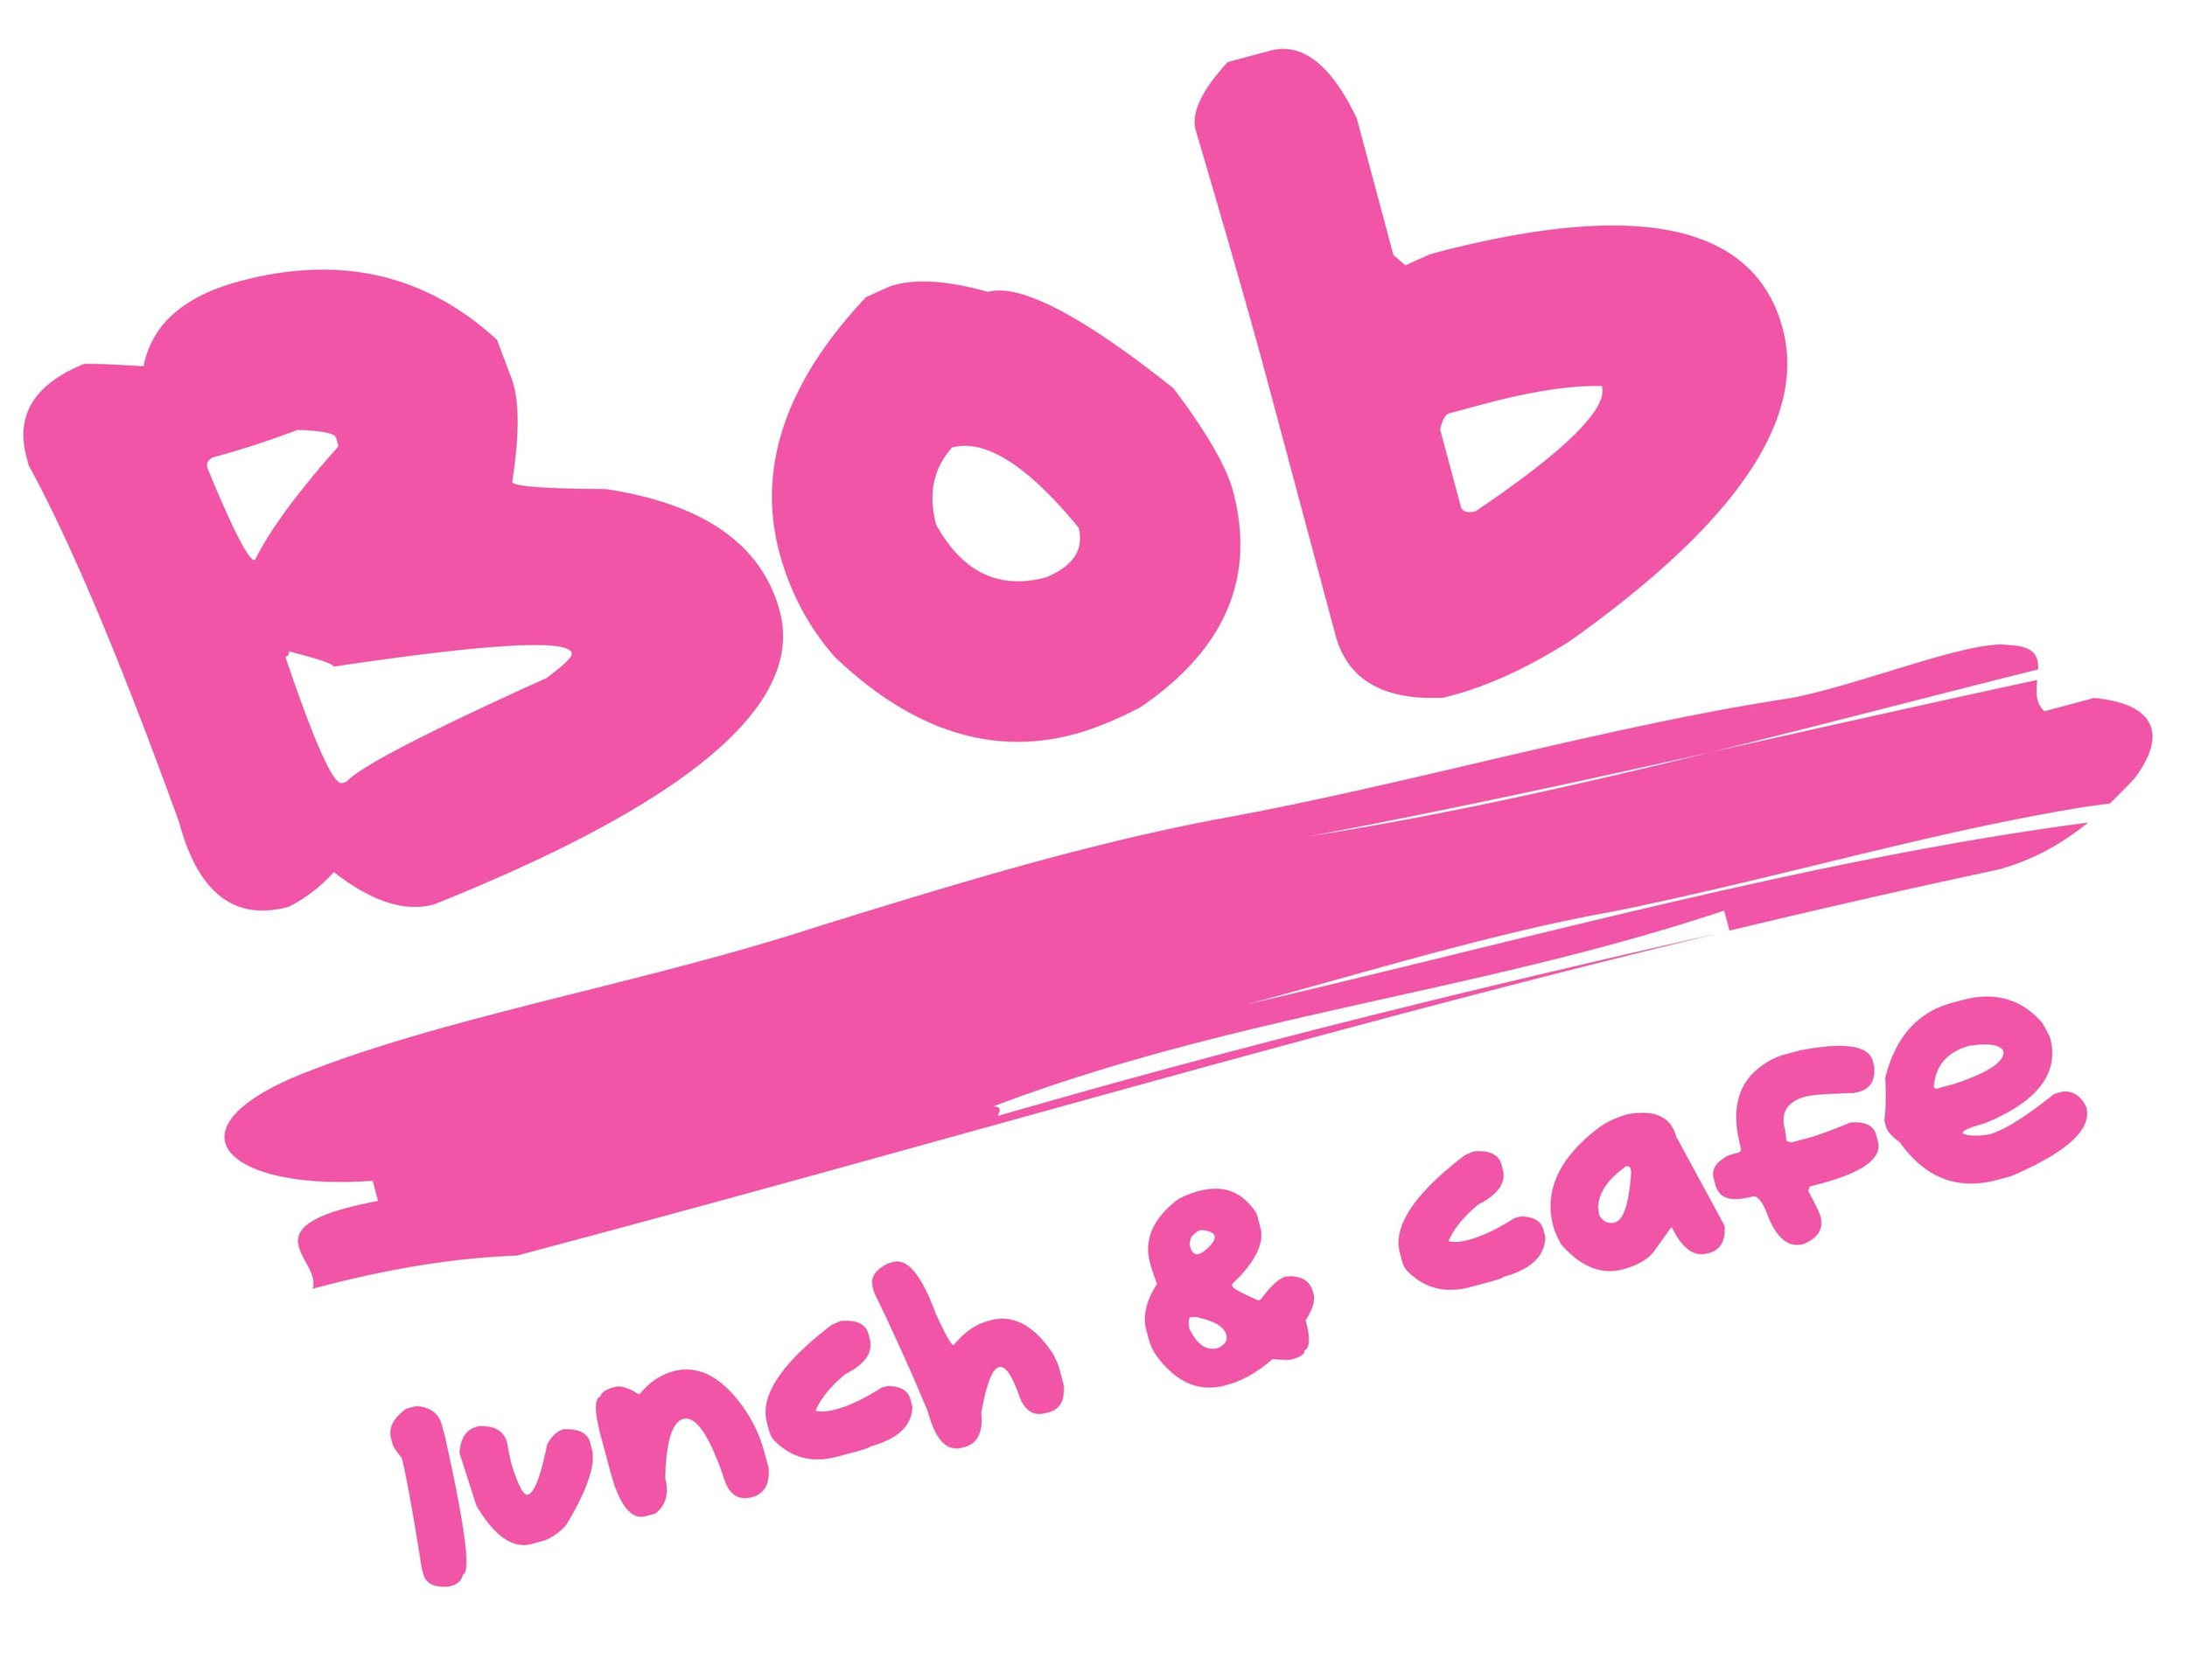 Bob-logo-lunch&cafe-1.jpg